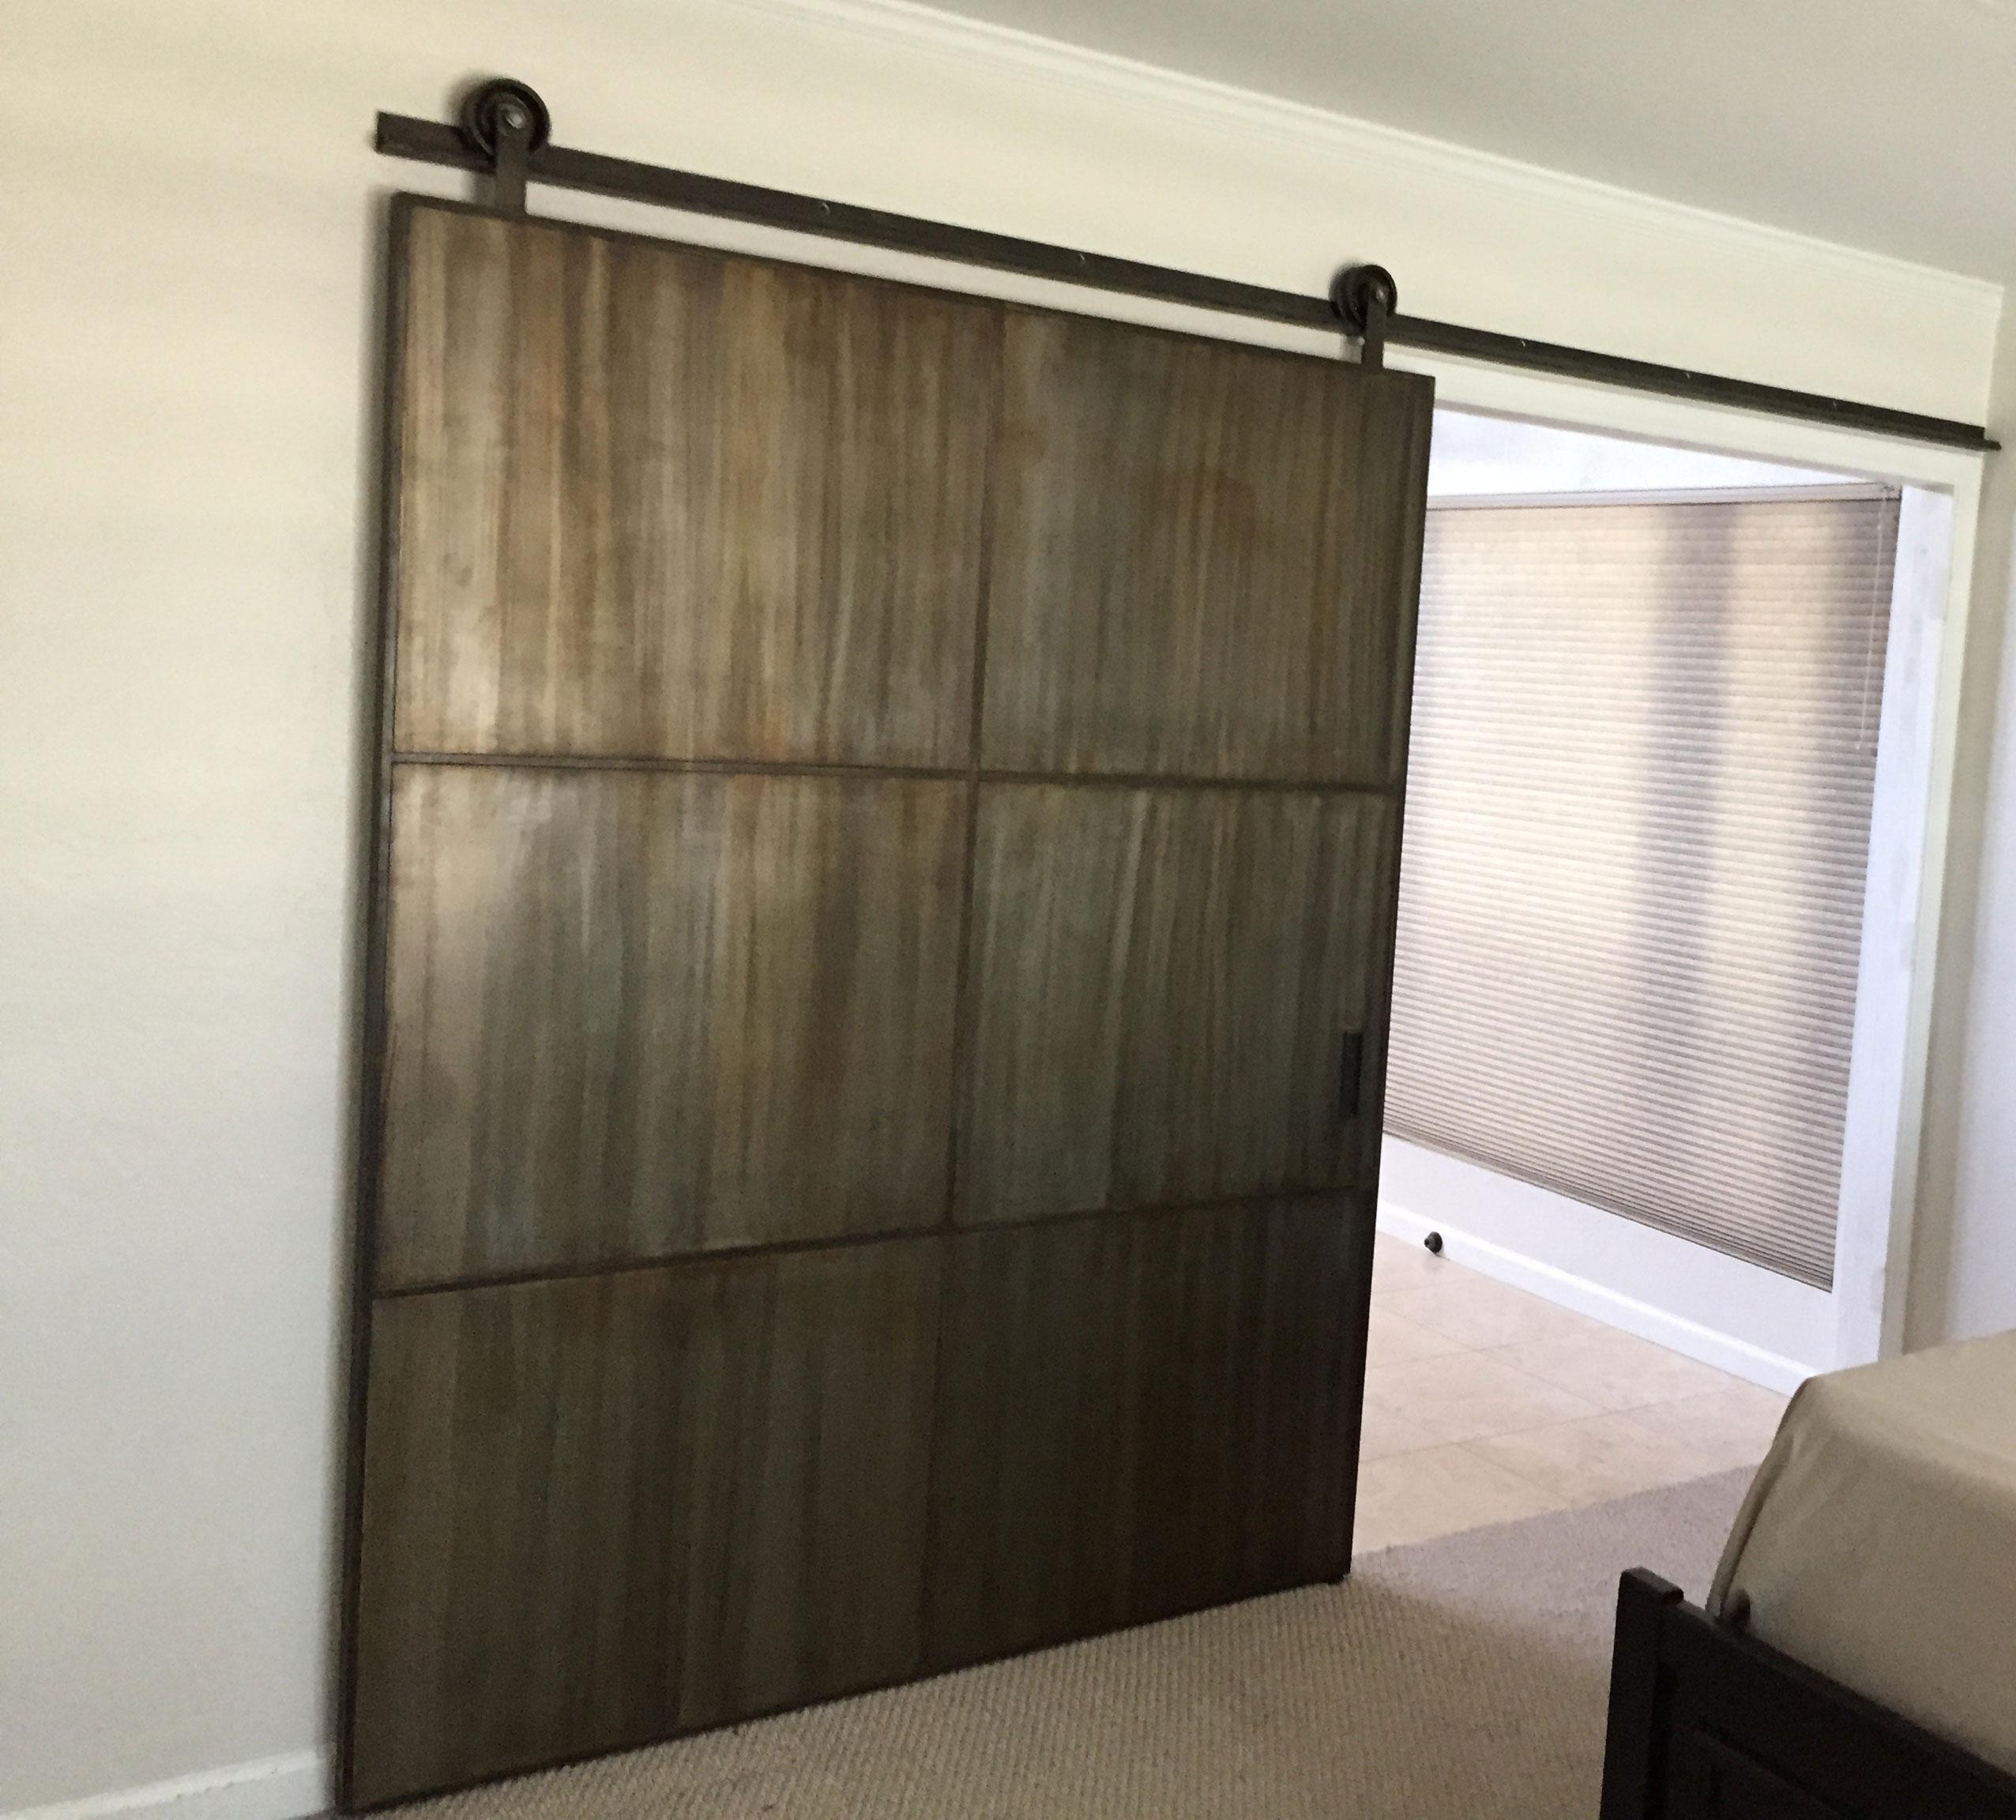 Large metal barn door with custom patina finish